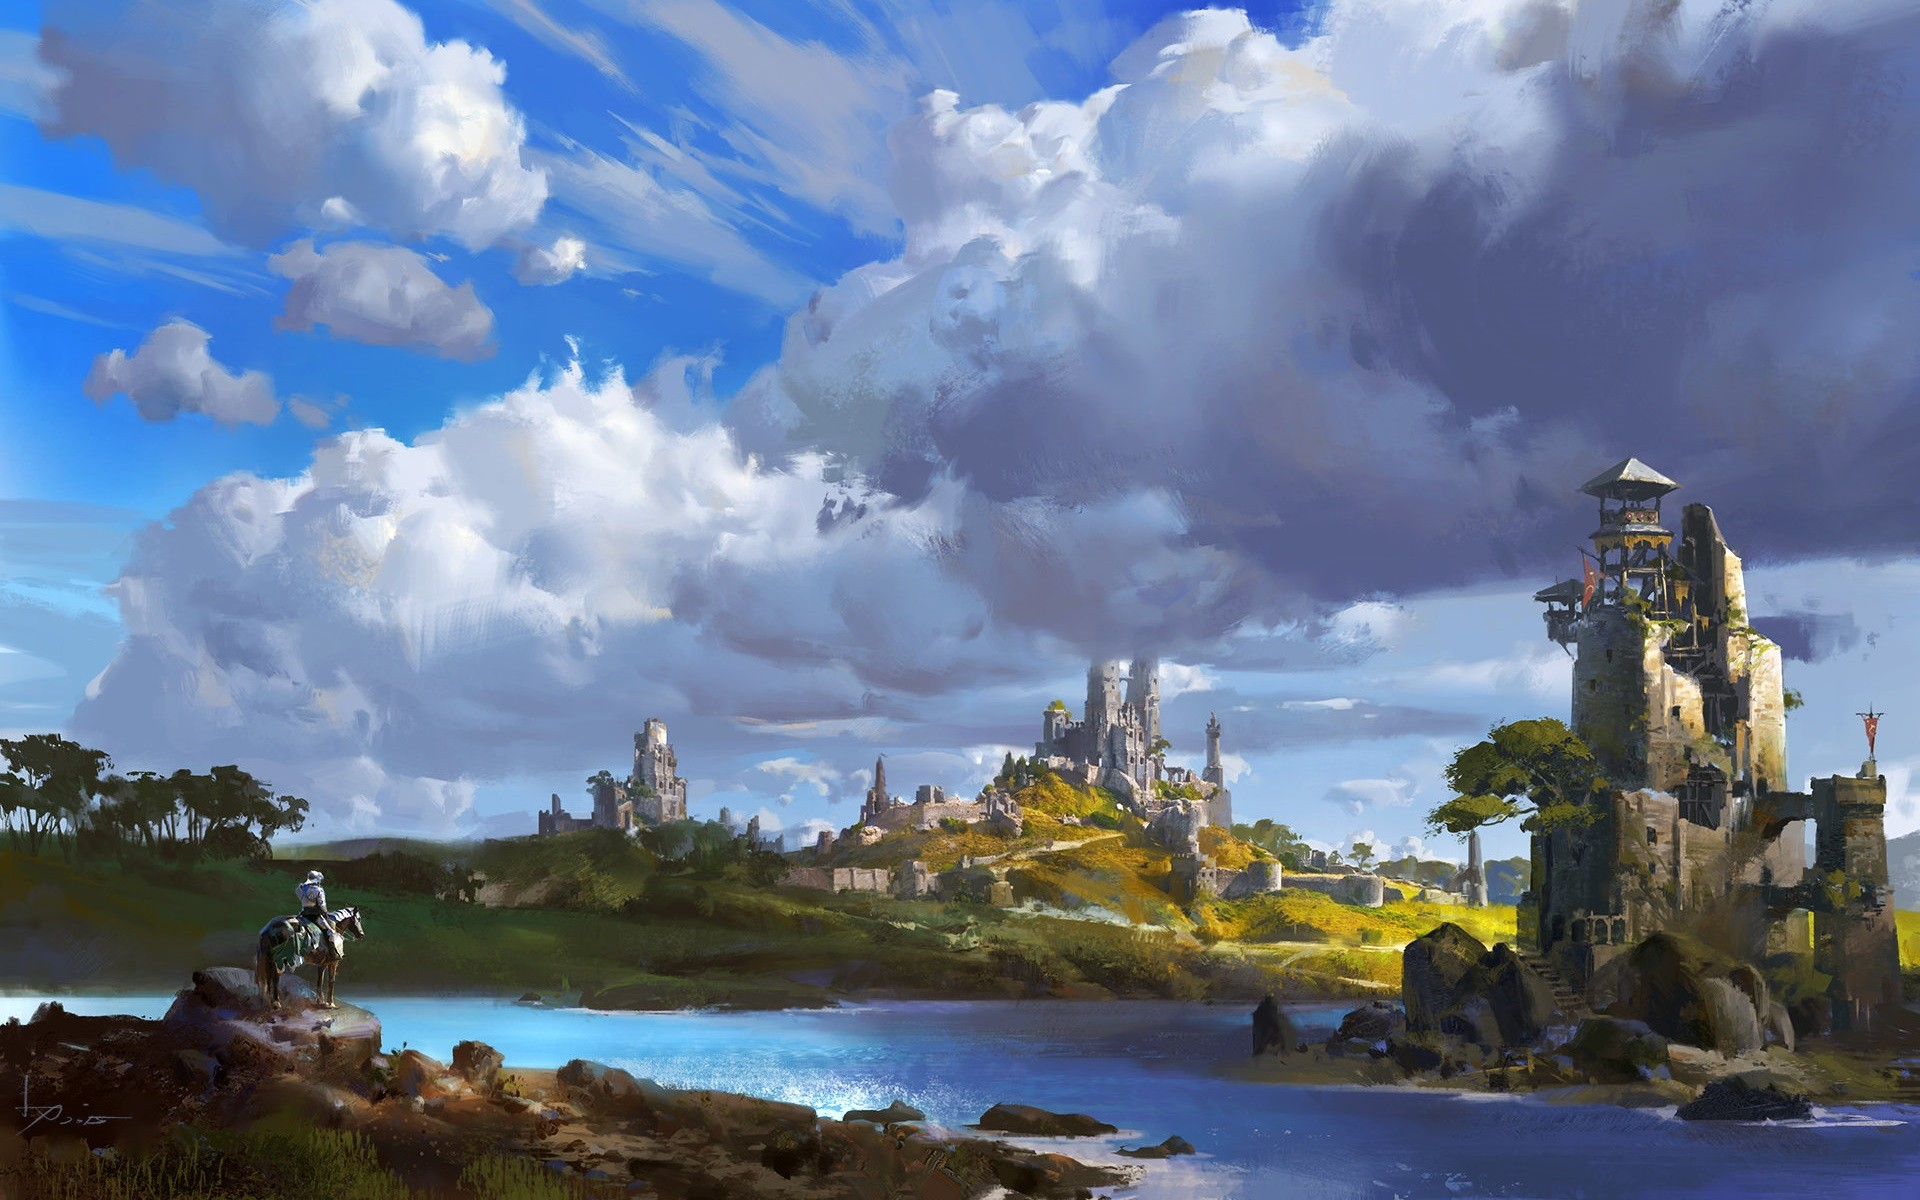 General 1920x1200 artwork concept art building castle river clouds landscape knight water